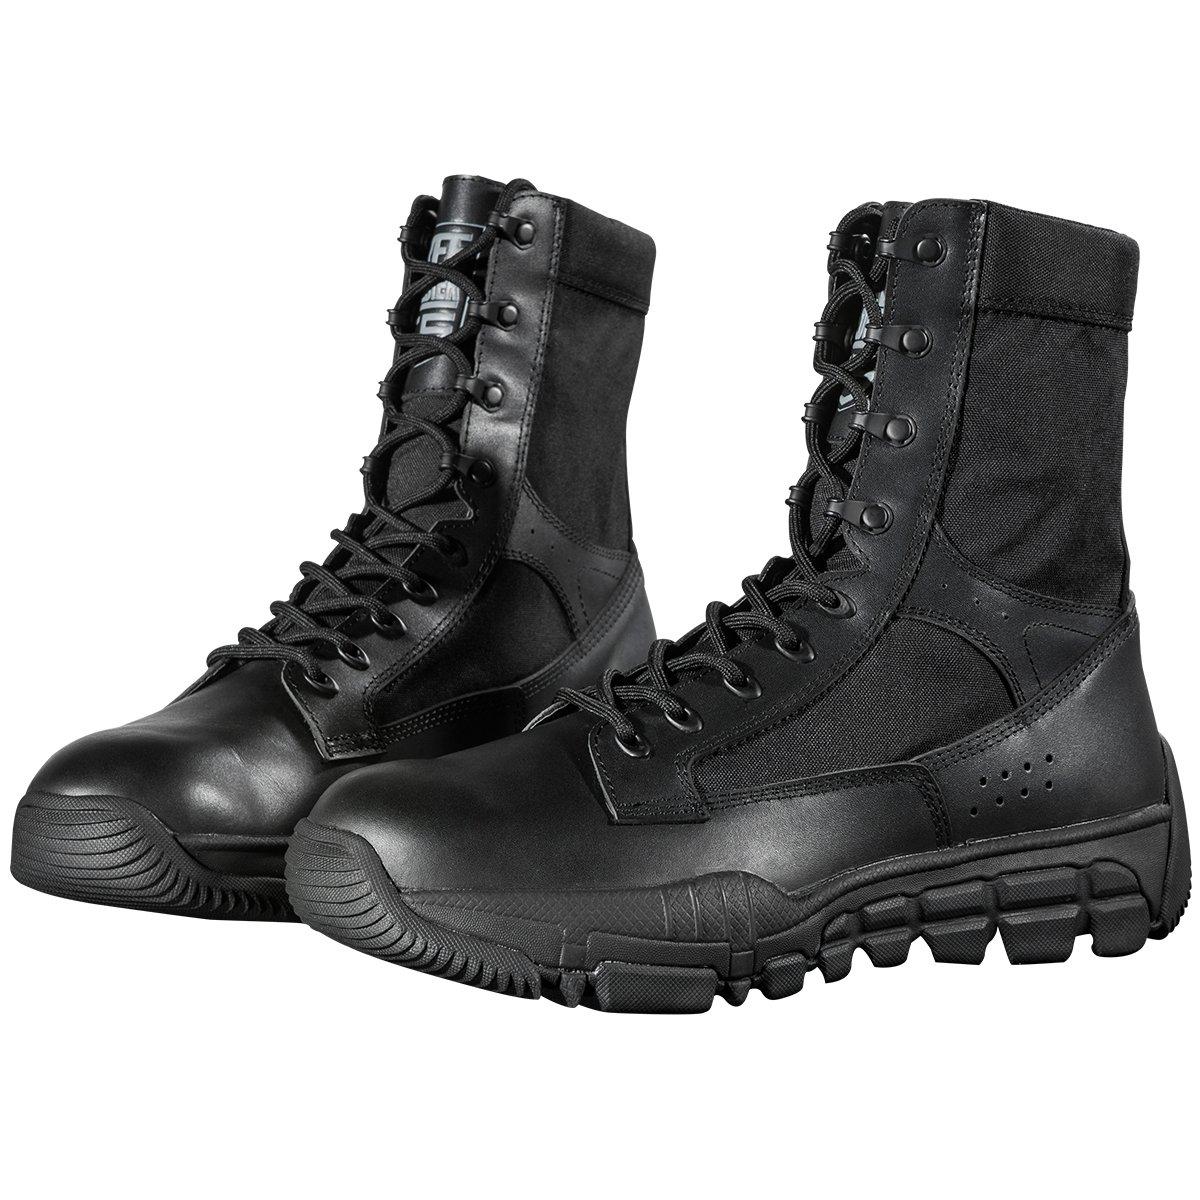 8228822c02c4d Amazon.com: FREE SOLDIER Men's Tactical Boots Suede Leather Mid Cut ...